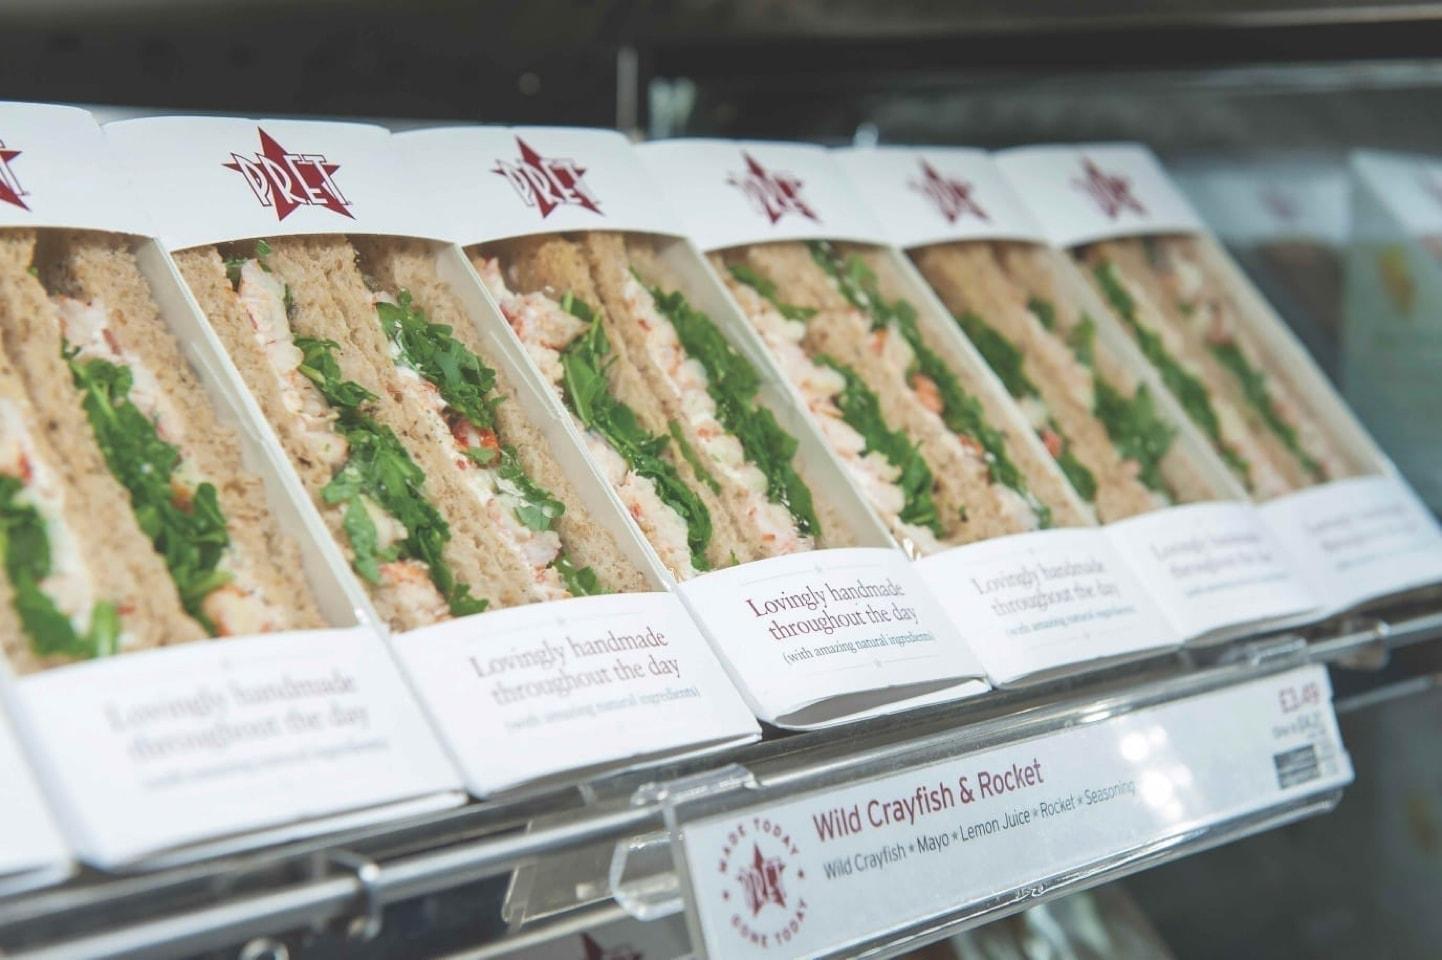 Smoked Salmon sandwich x 1